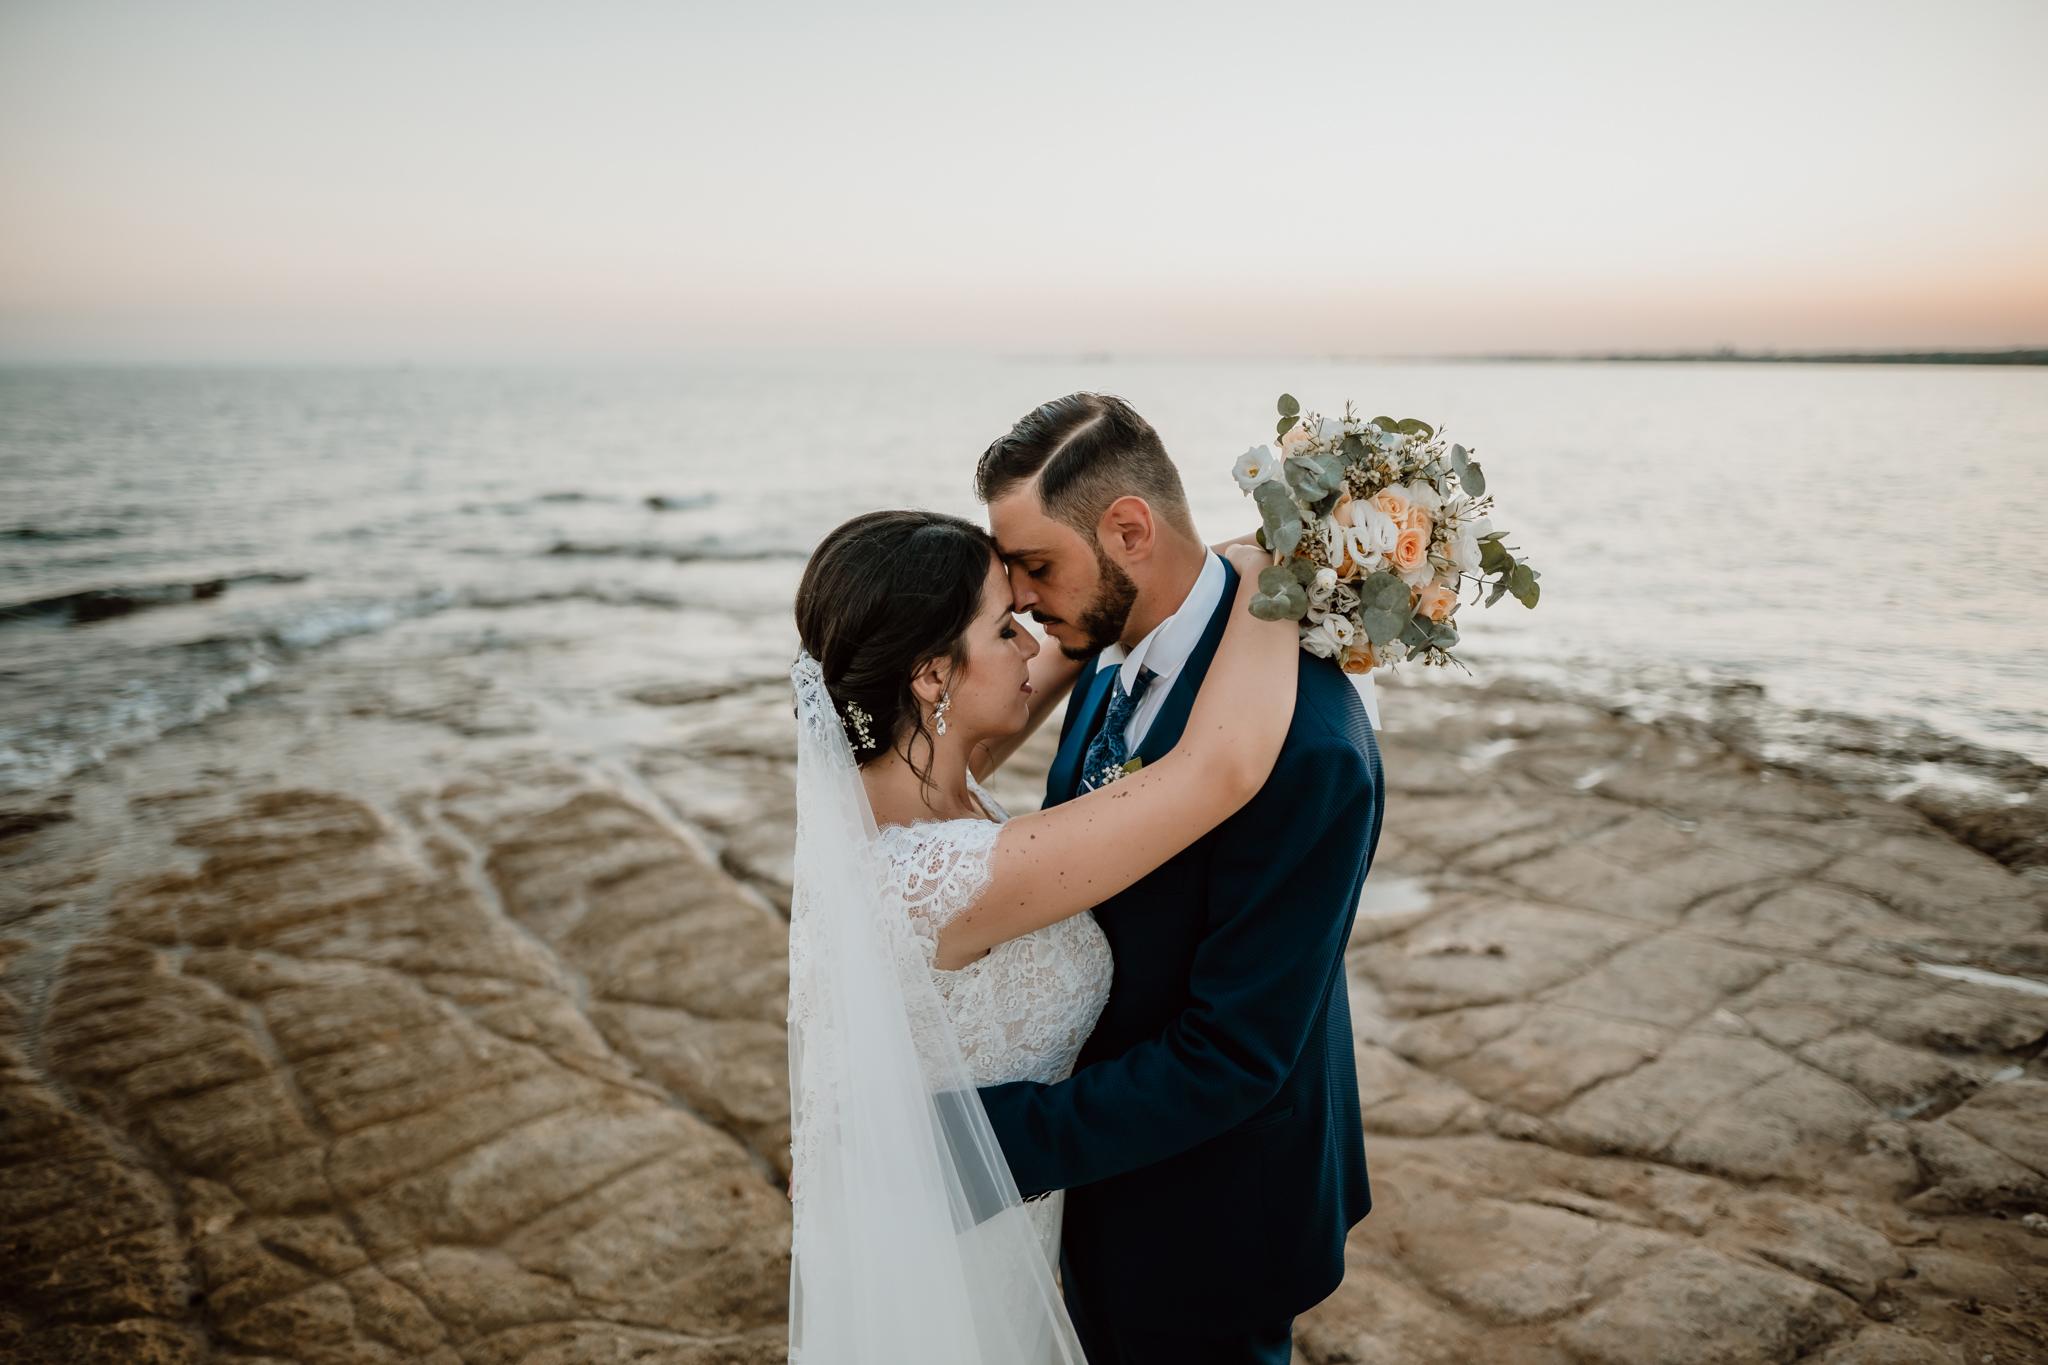 Fotografo matrimonio Pozzallo 43